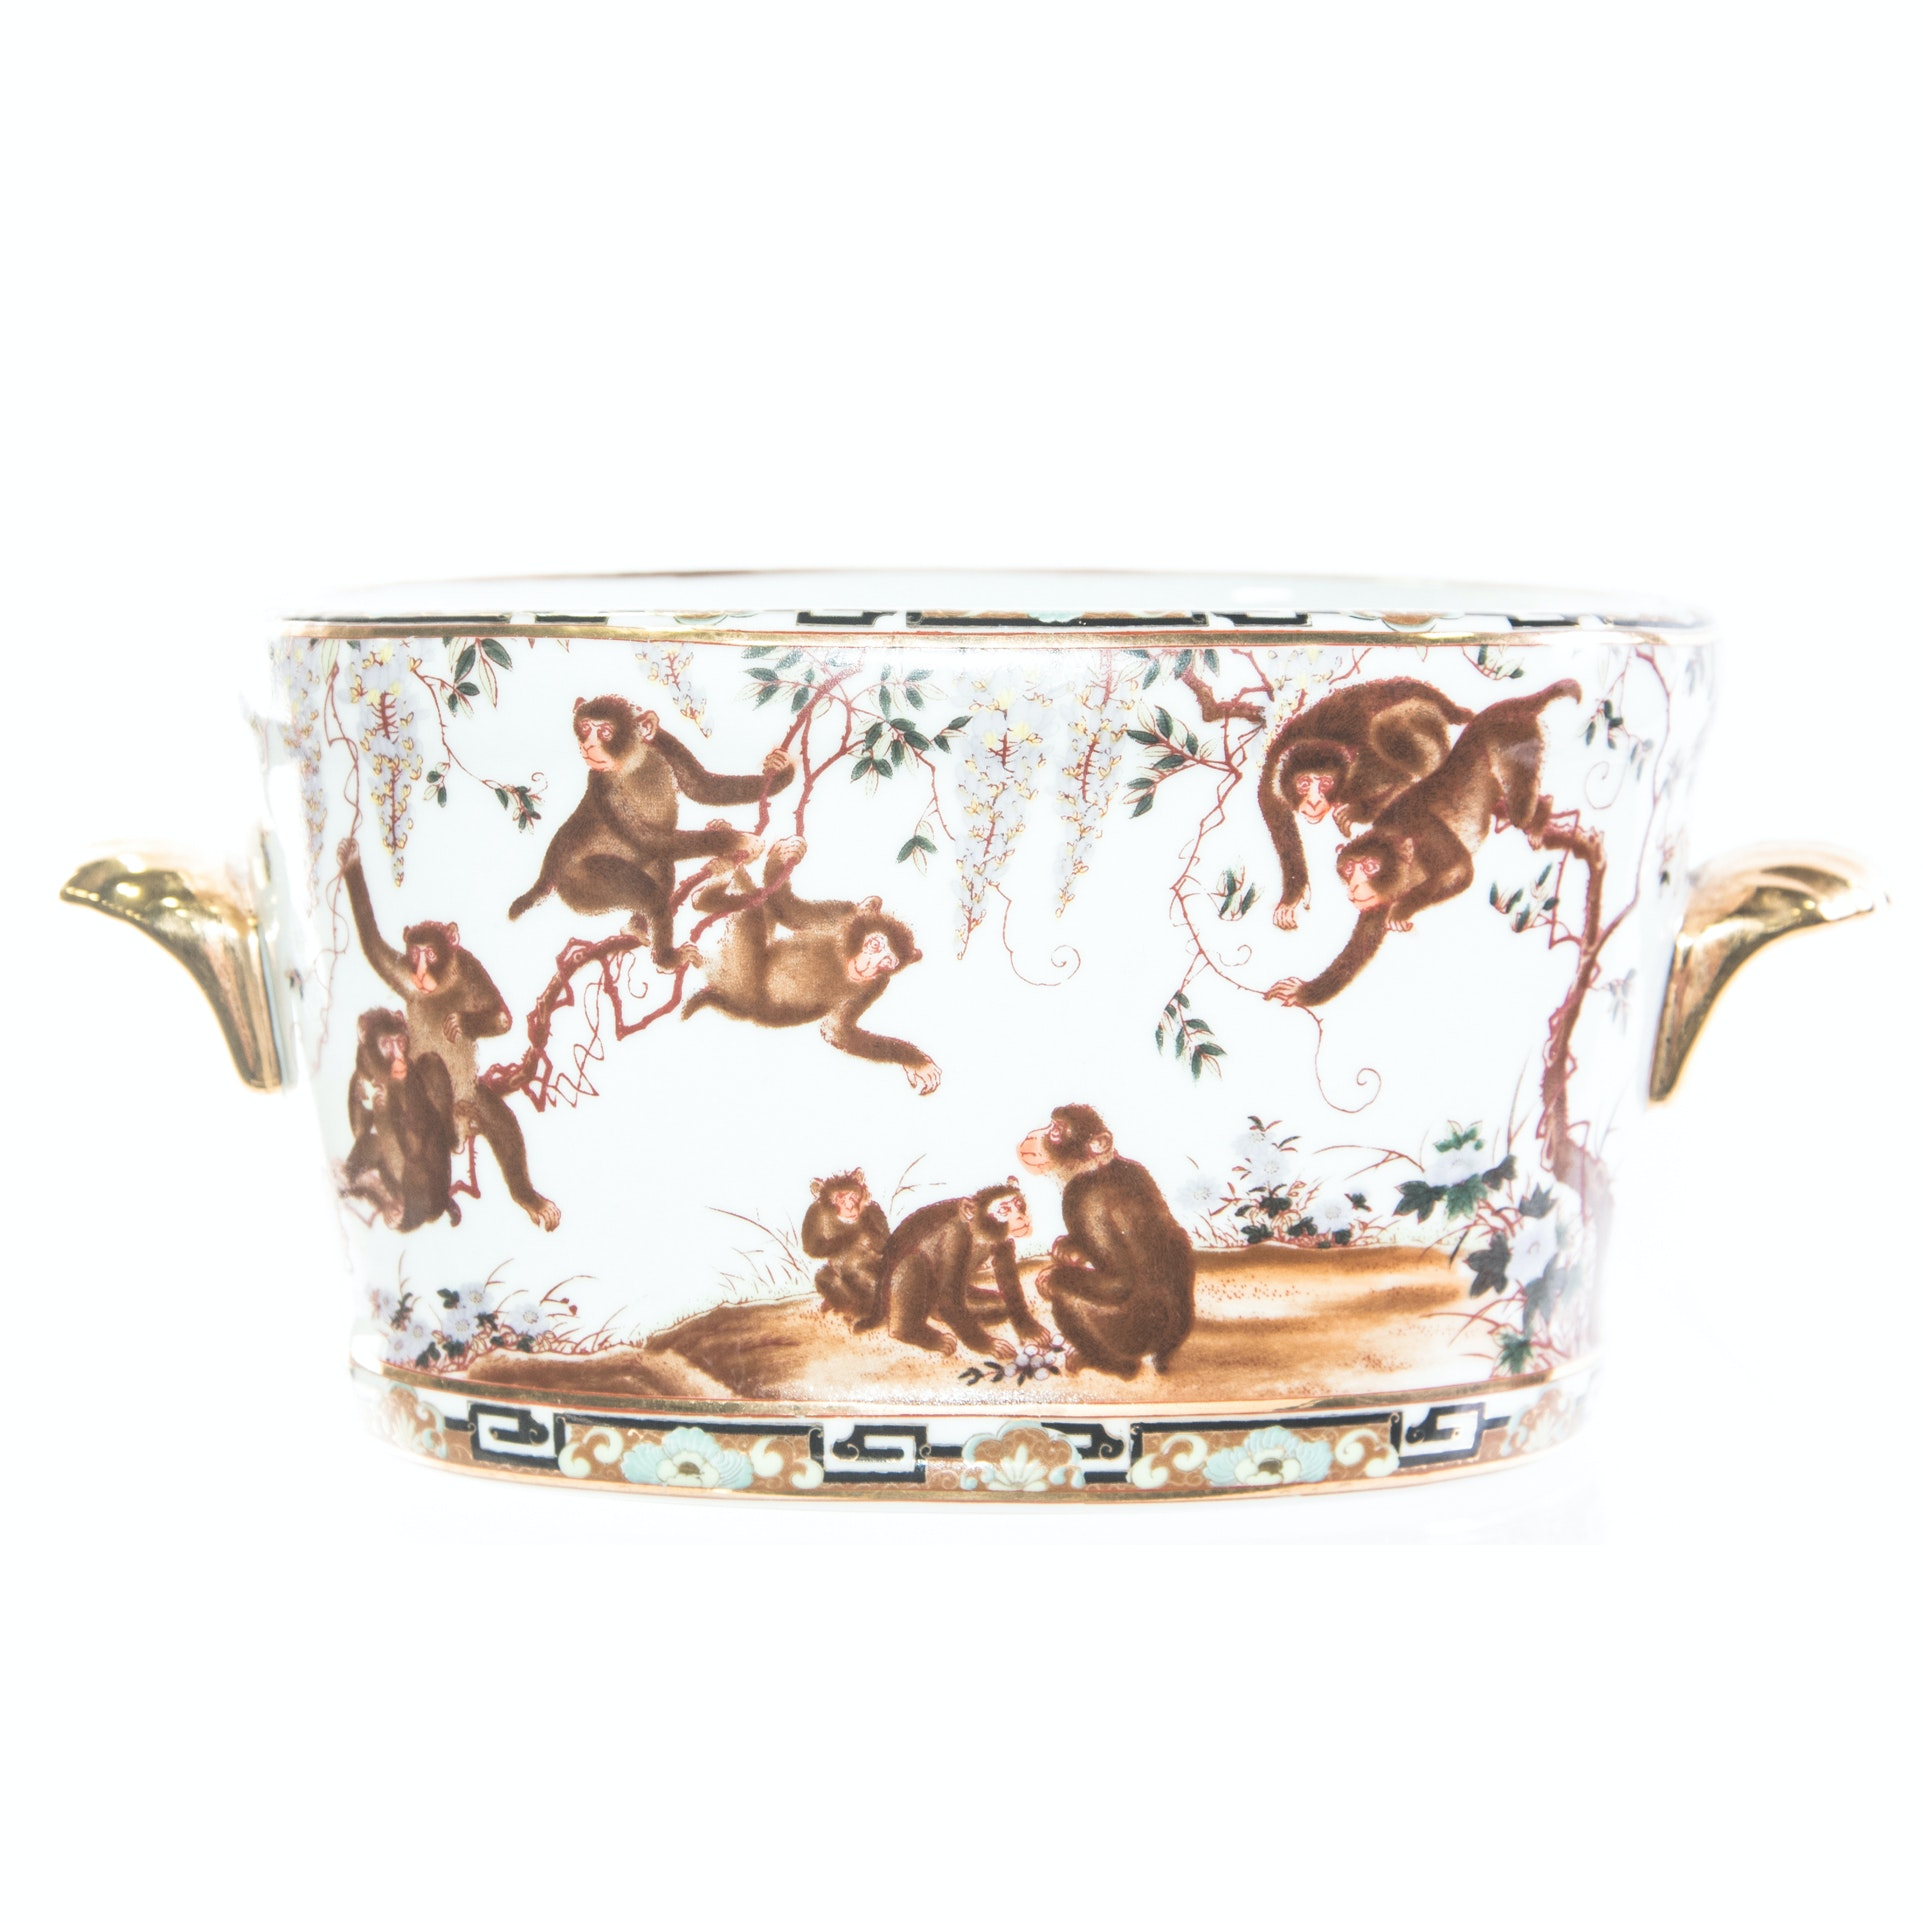 Monkey Themed Ceramic Jardiniere